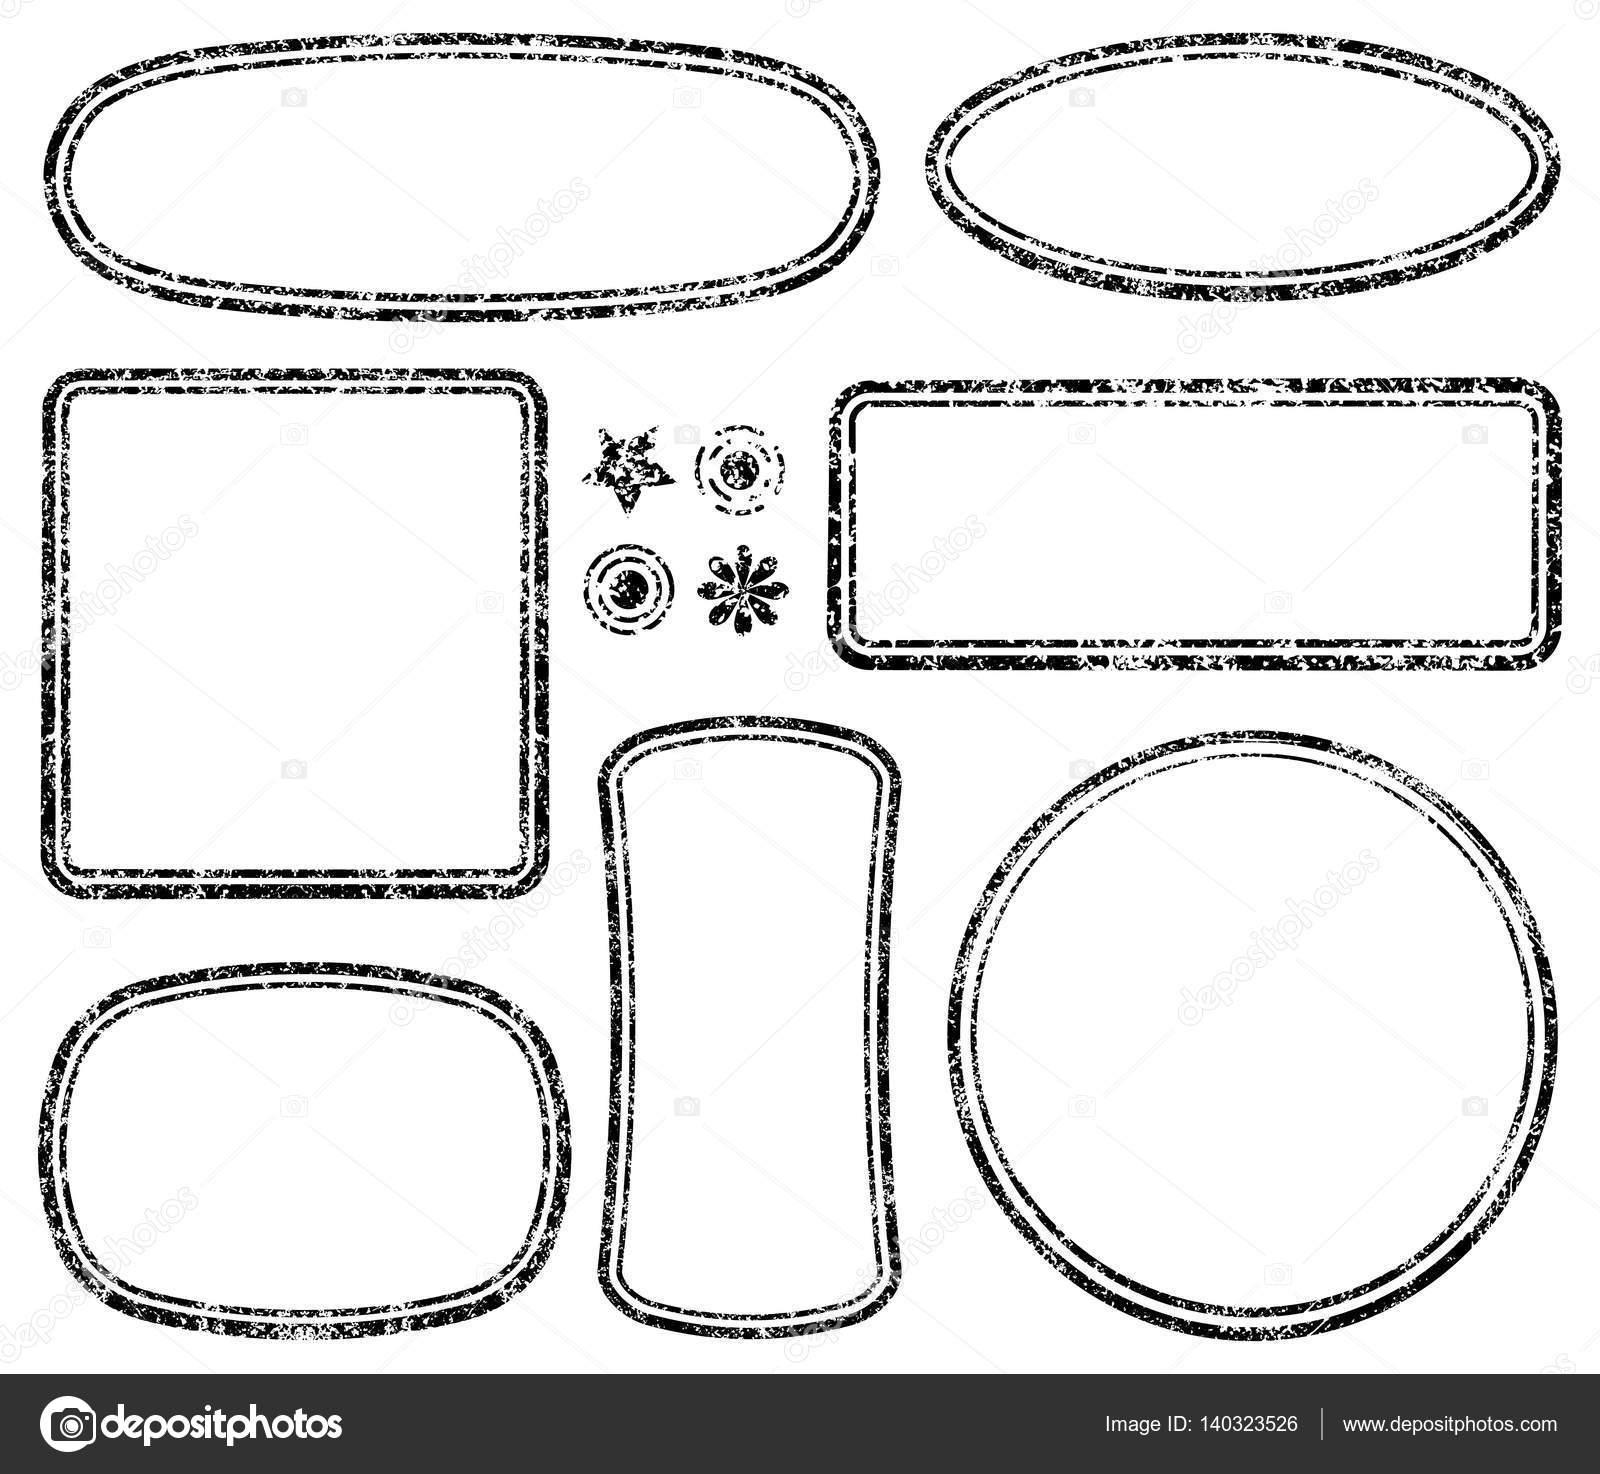 templates for rubber stamps stock vector antonshpak 140323526